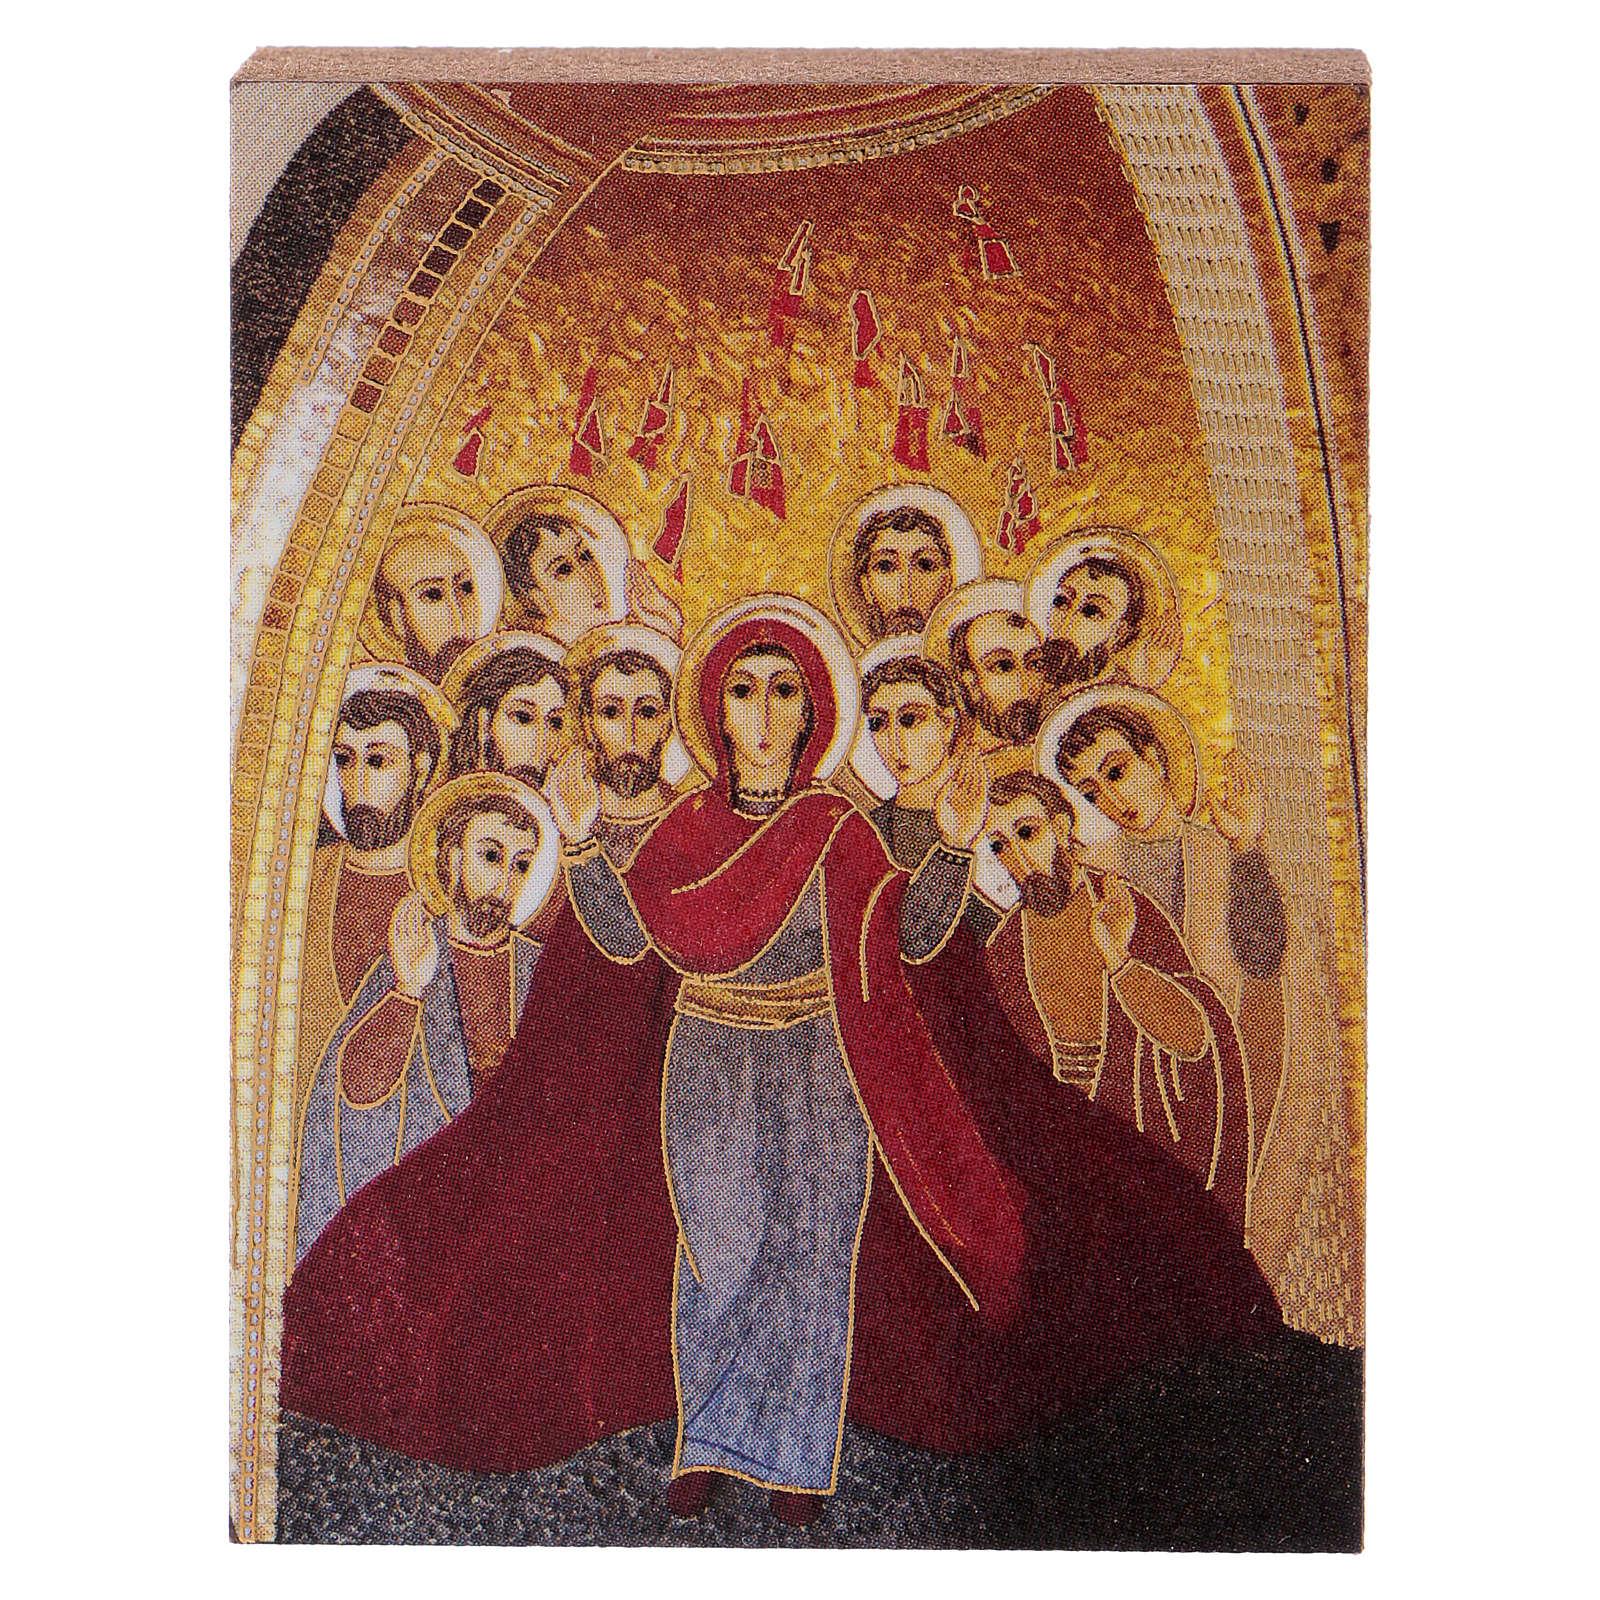 Pentecoste Rupnik stampa 5x5 cm 3